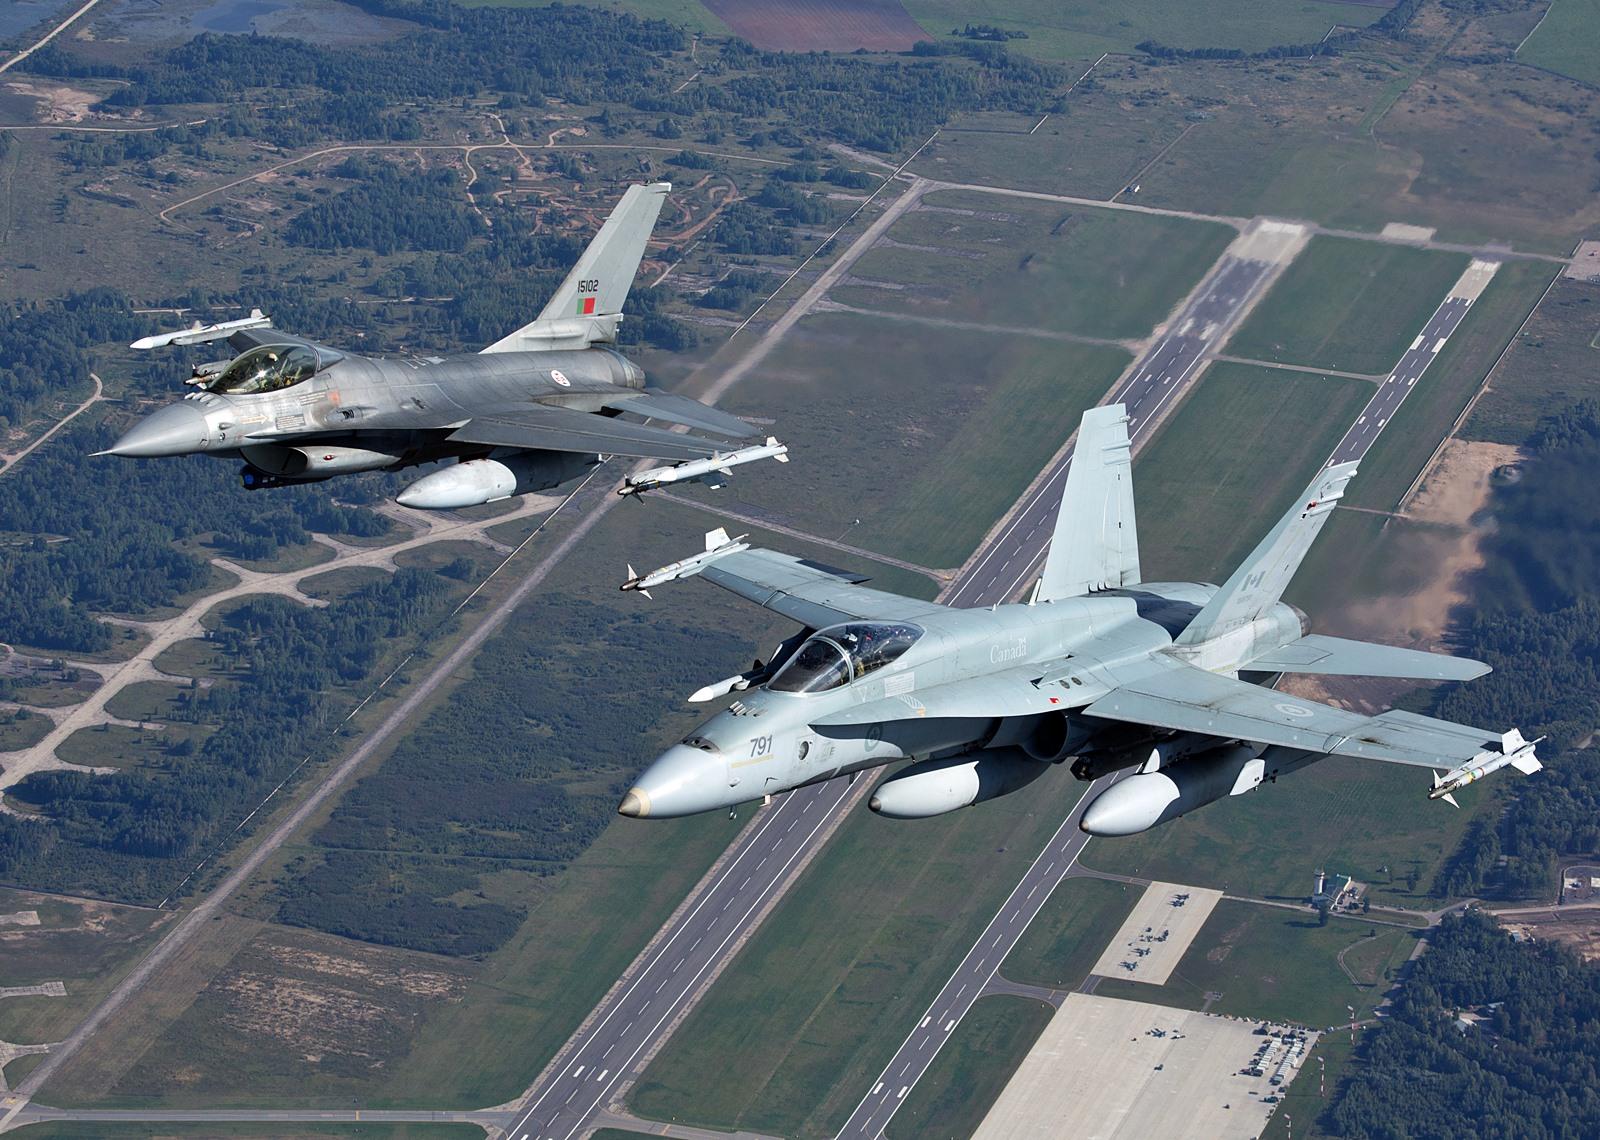 BAP 임무중인 캐나다공군 CF-188과 포르투갈공군 F..